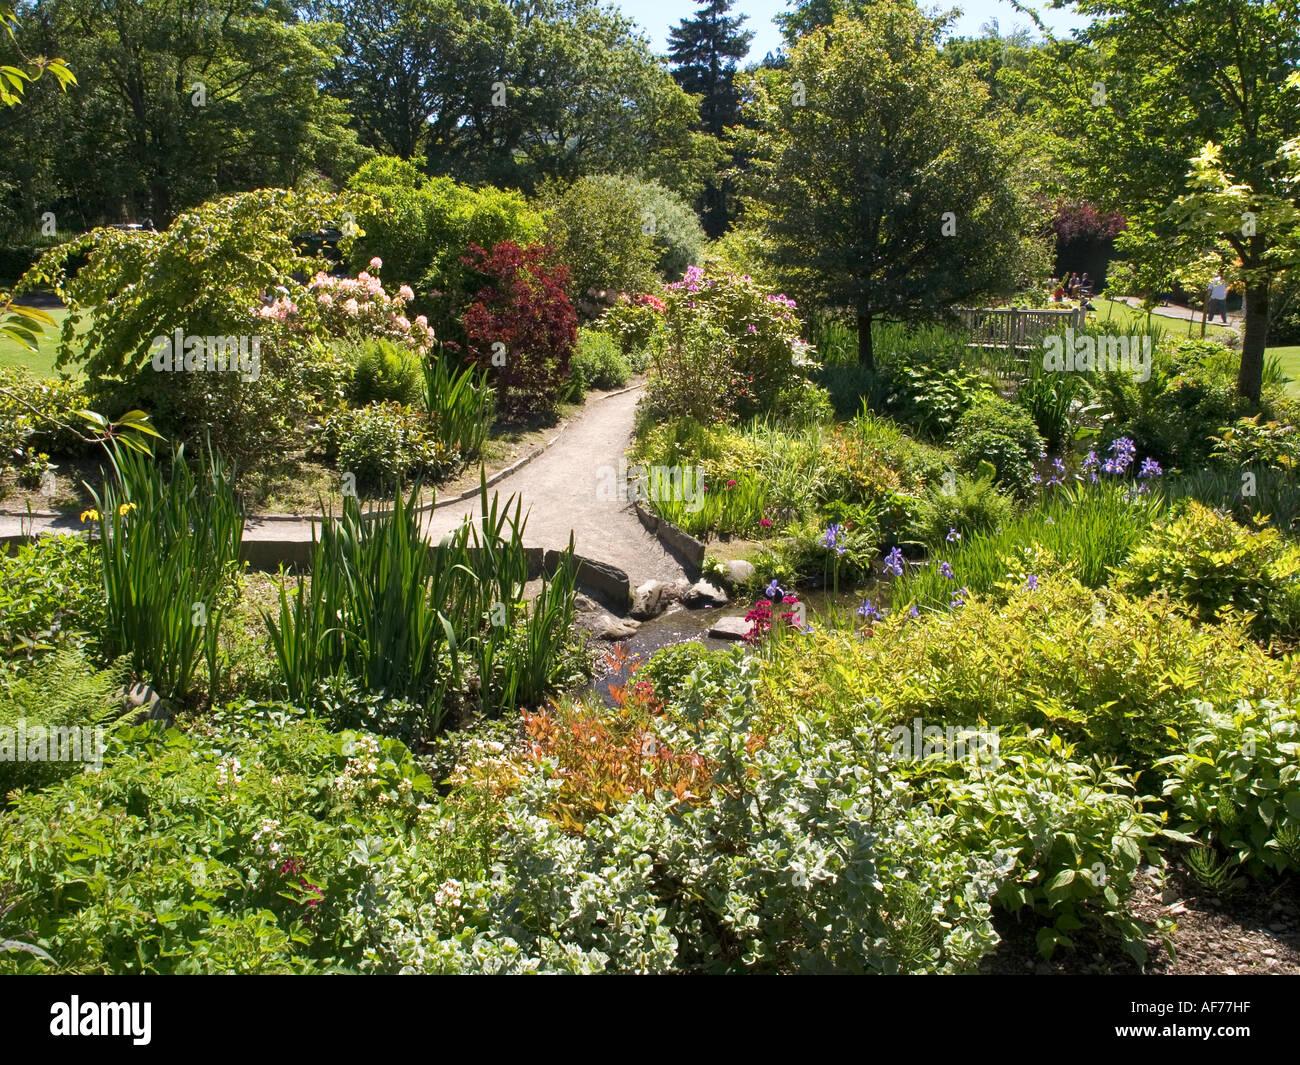 Summer gardens at Keswick in the English Lake District - Stock Image